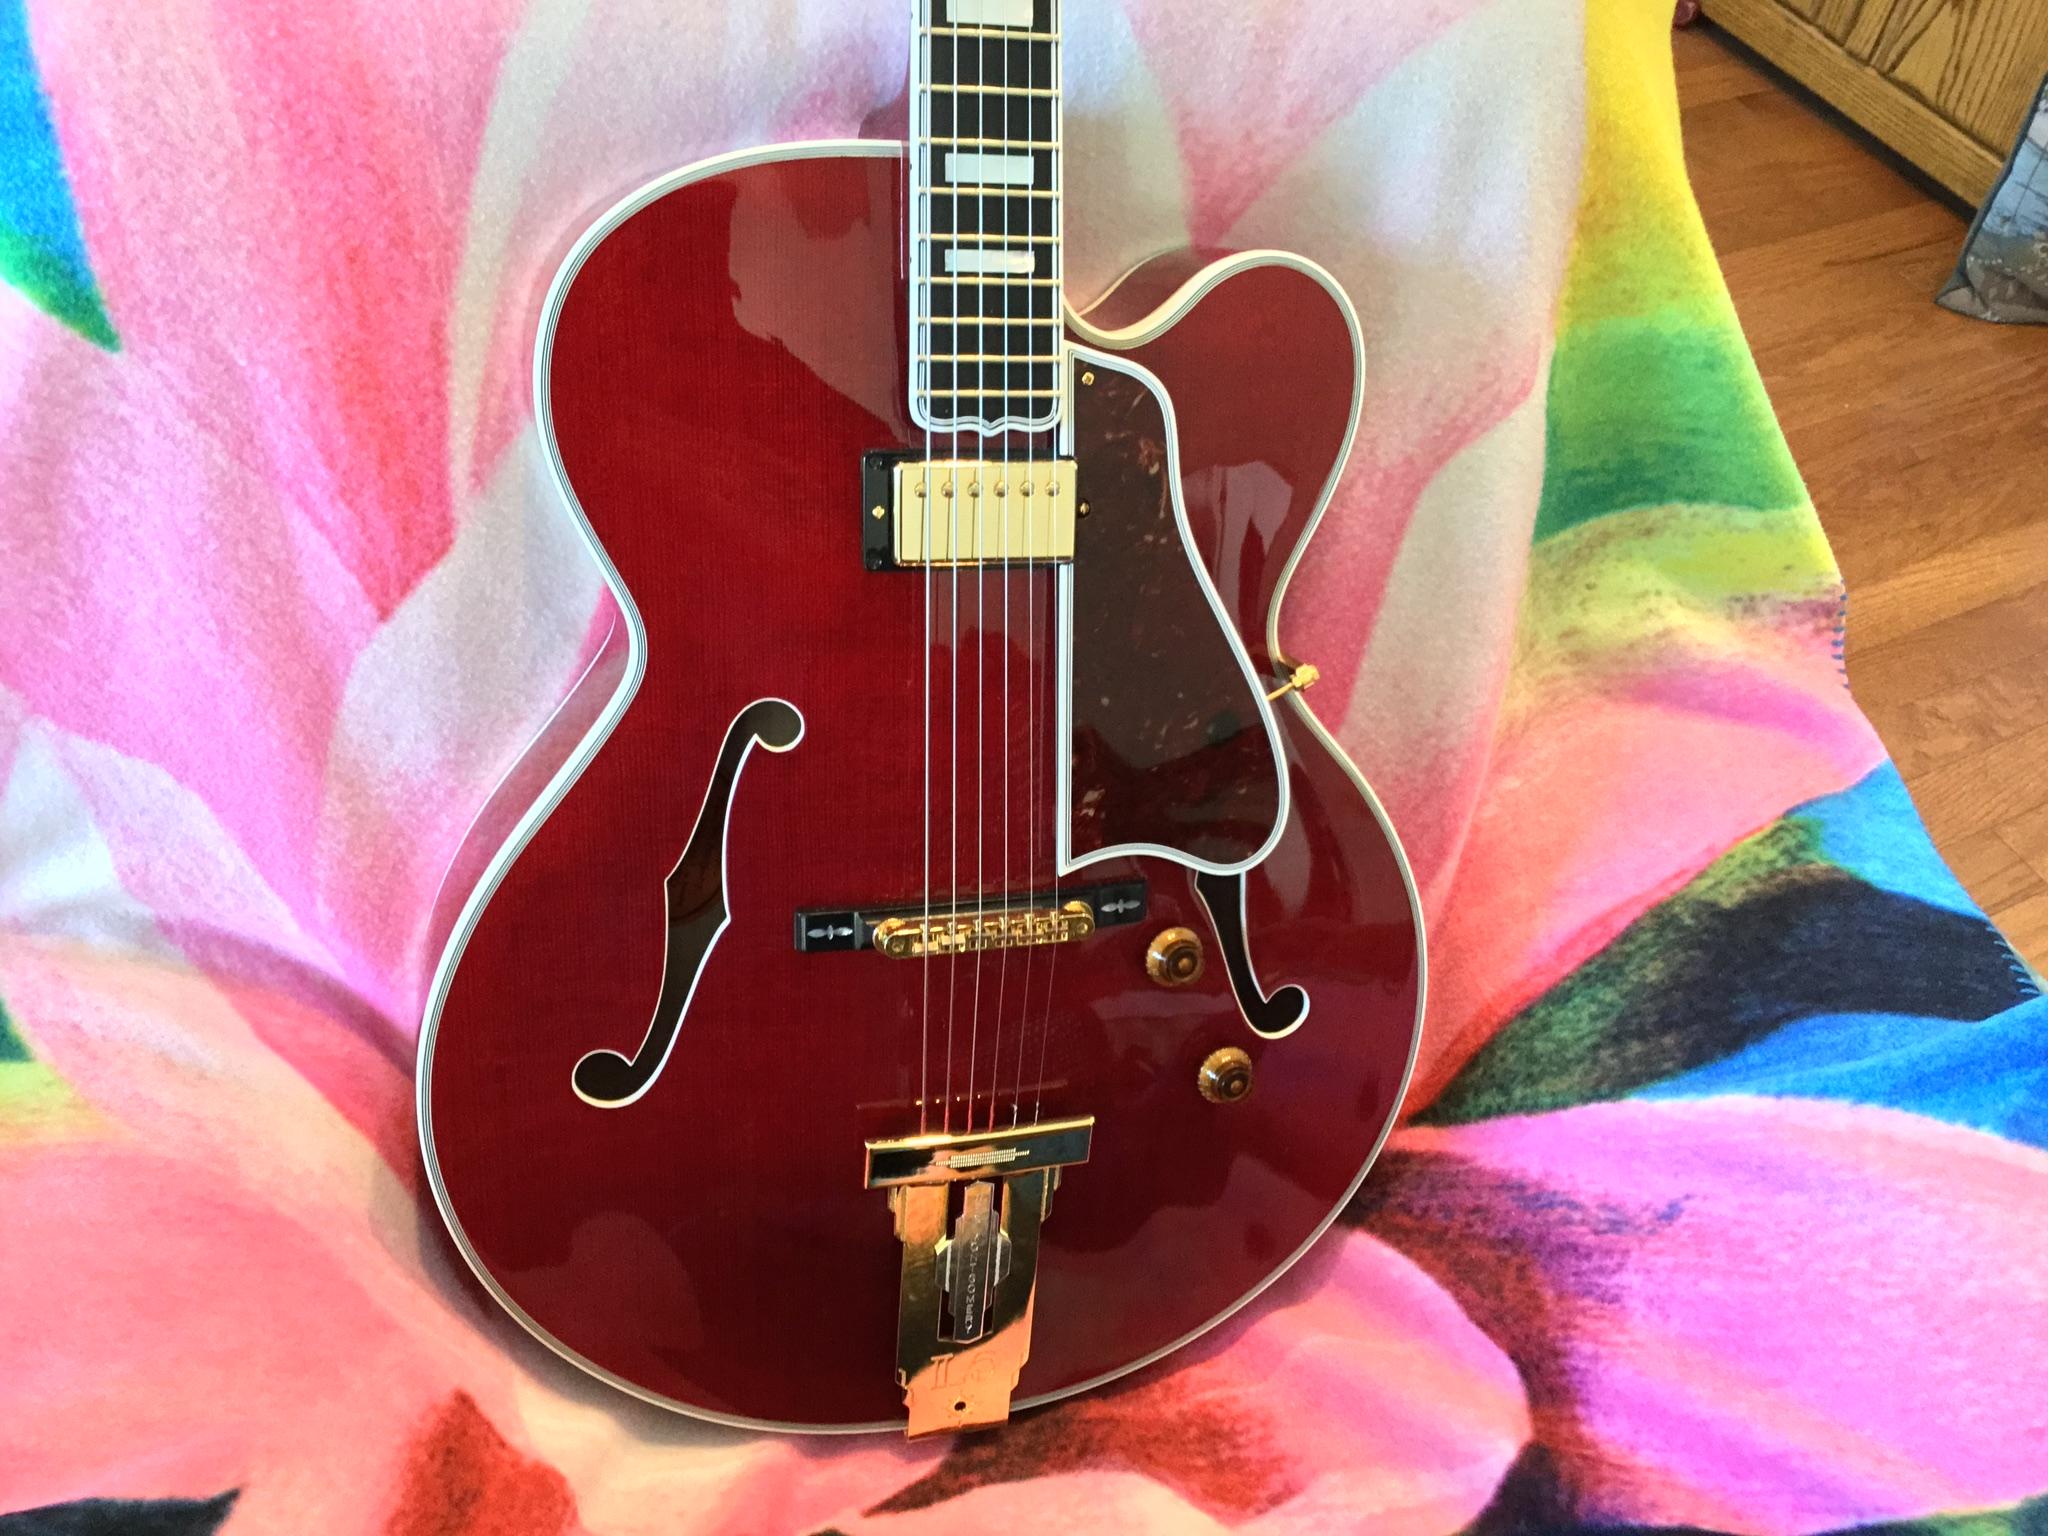 Dream guitar buying issues-60395417-18b7-4a4b-aaec-f717f1042383-jpeg